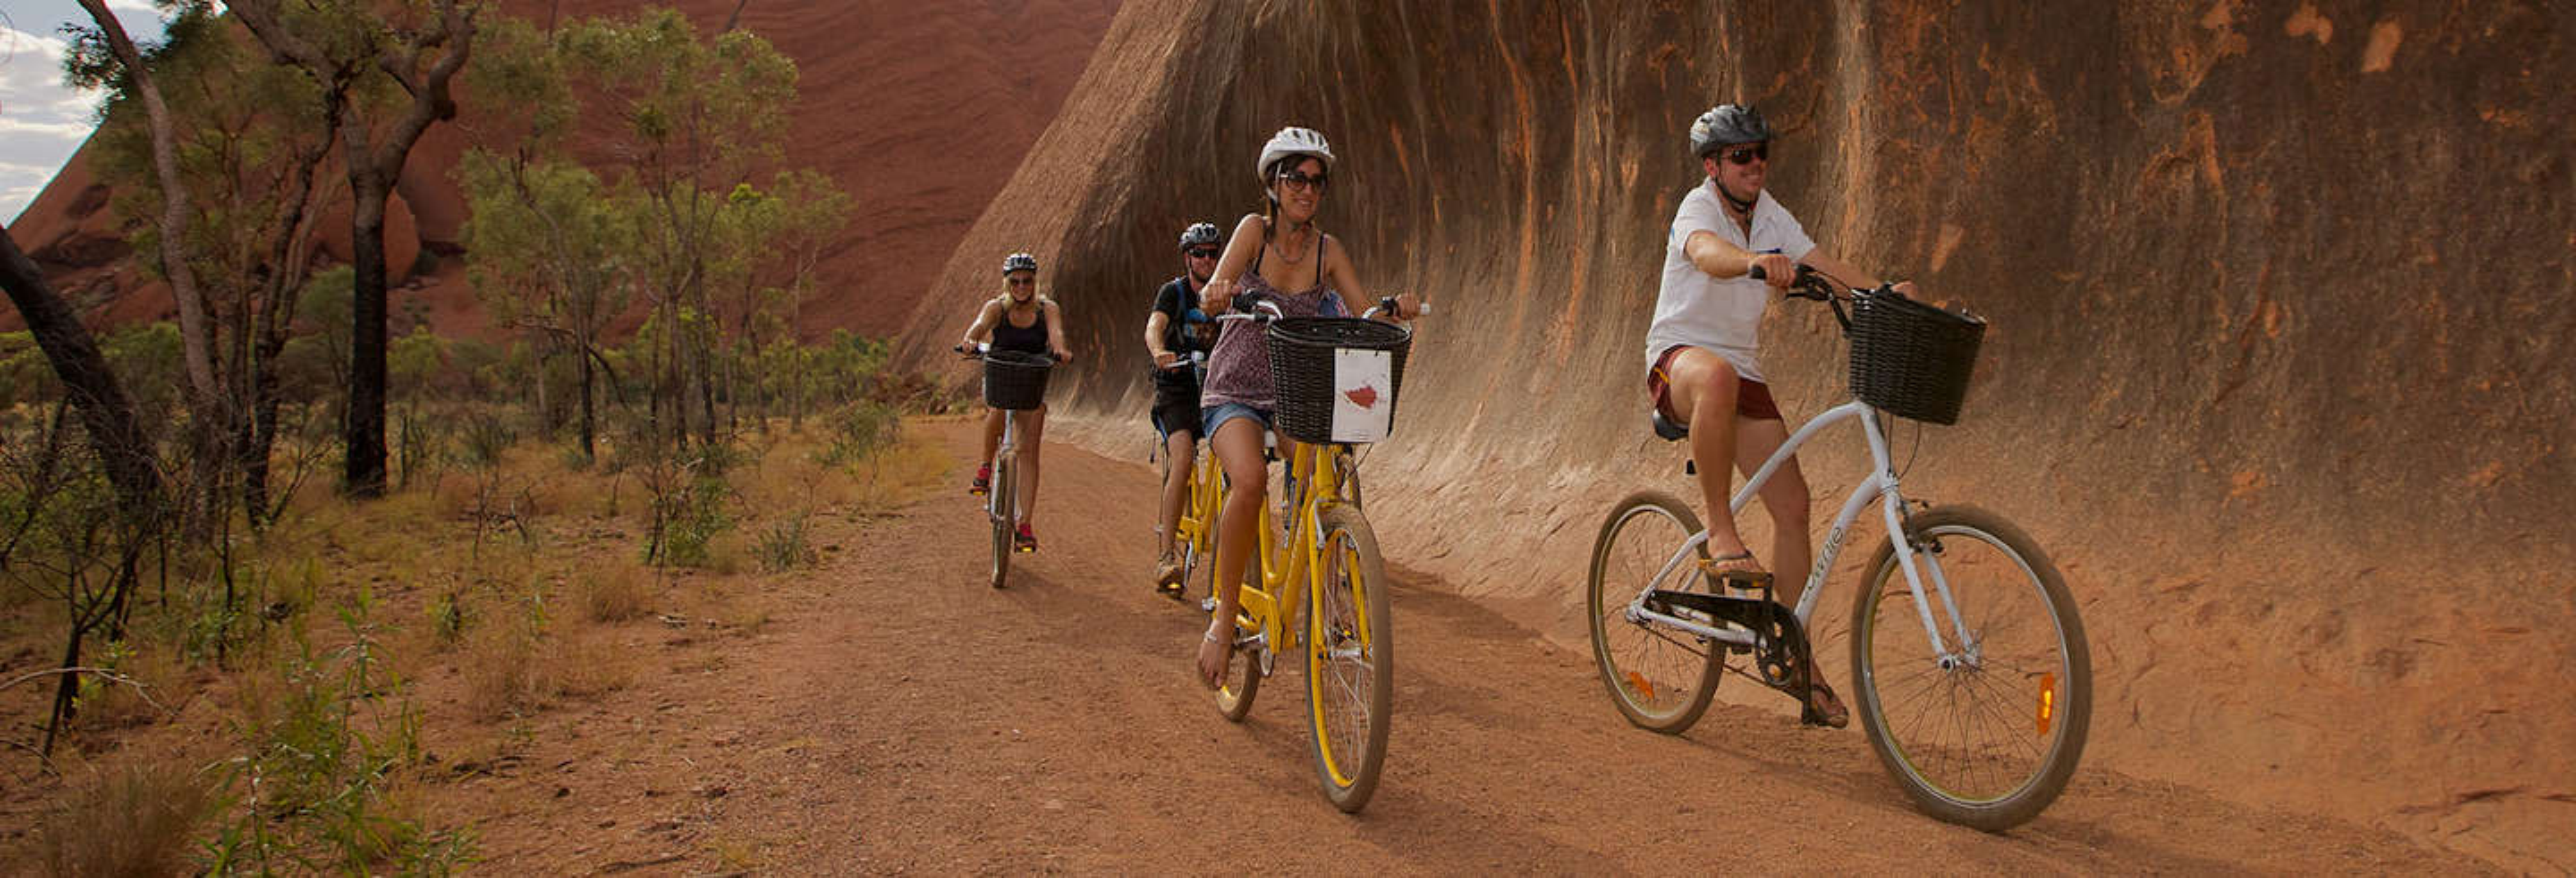 Aluguel de bicicleta em Uluru-Kata Tjuta